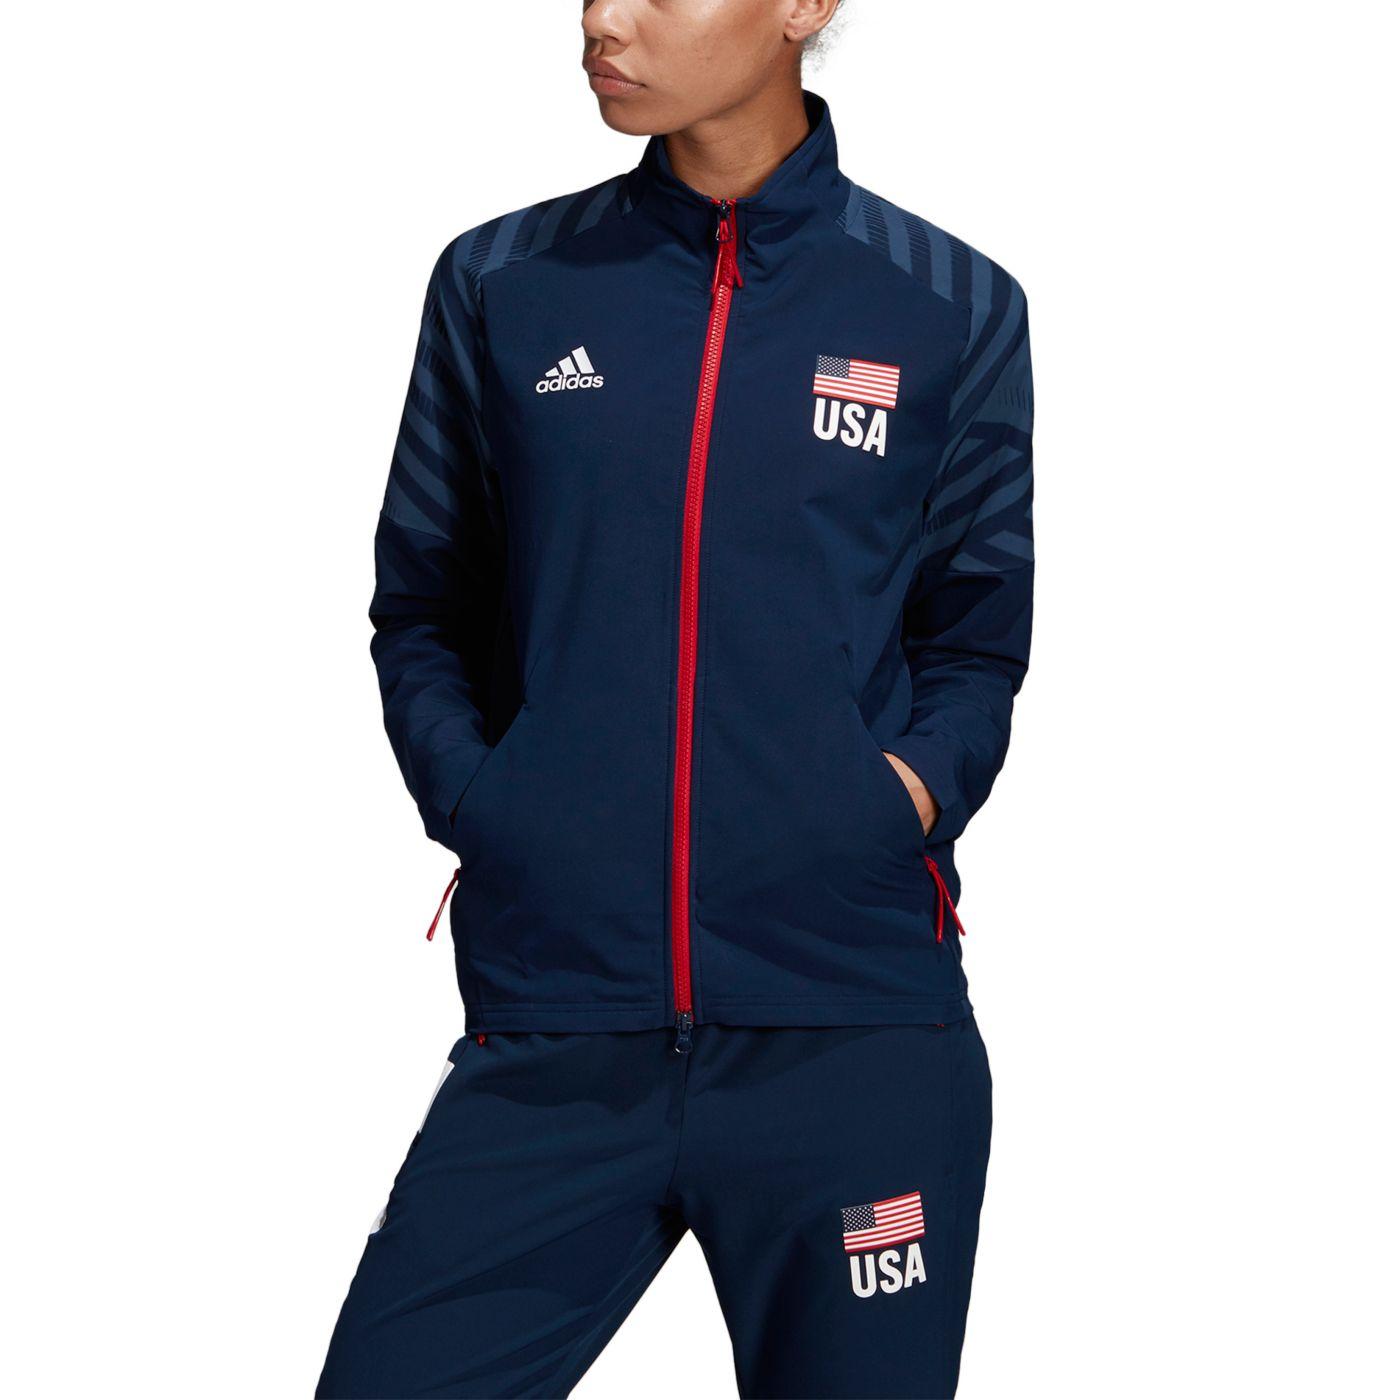 Adidas Women's USA Volleyball Warm-Up Jacket